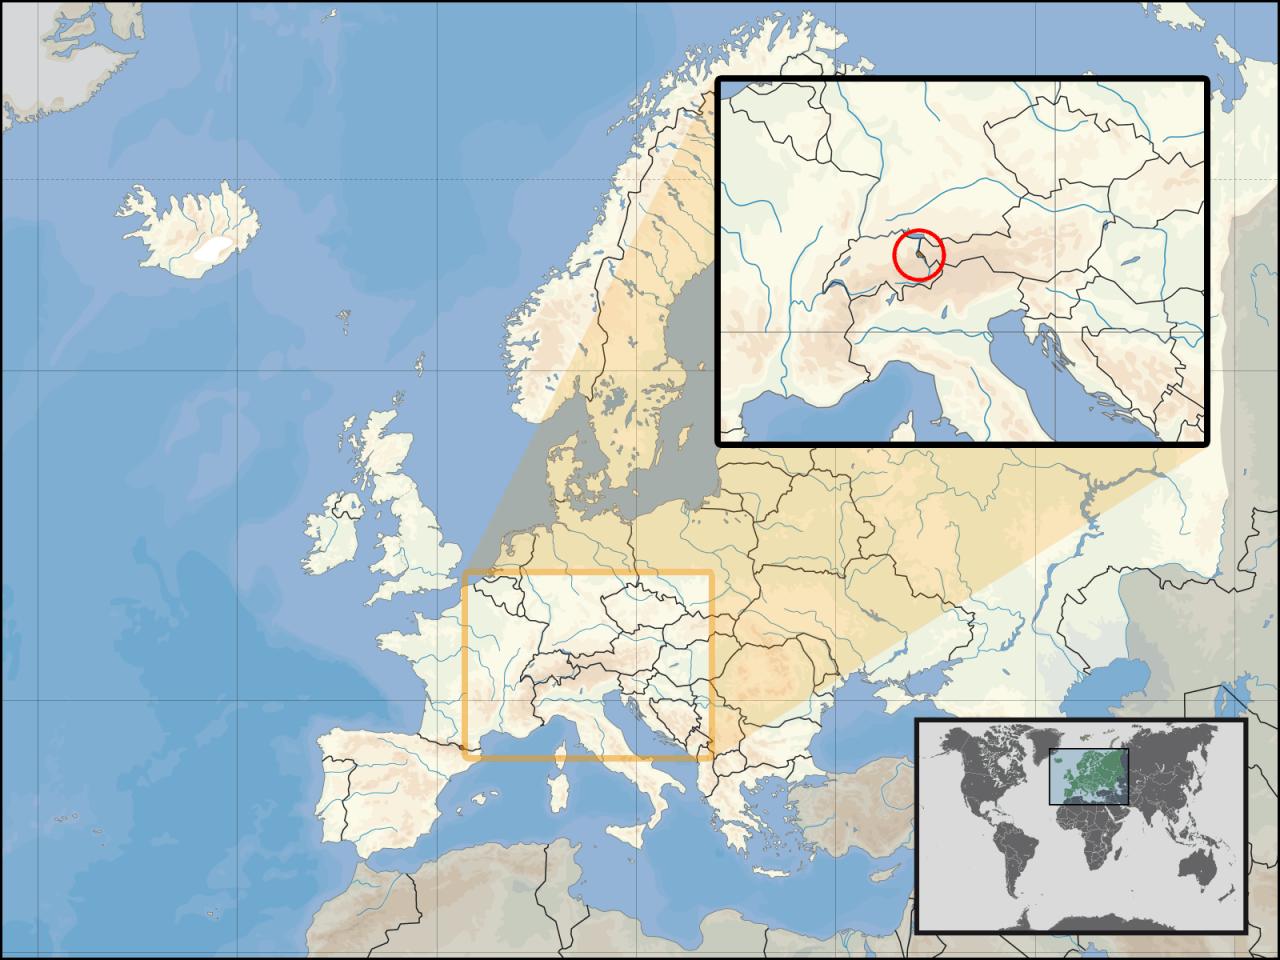 Lokalizacja Liechtensteinu na tle Europy